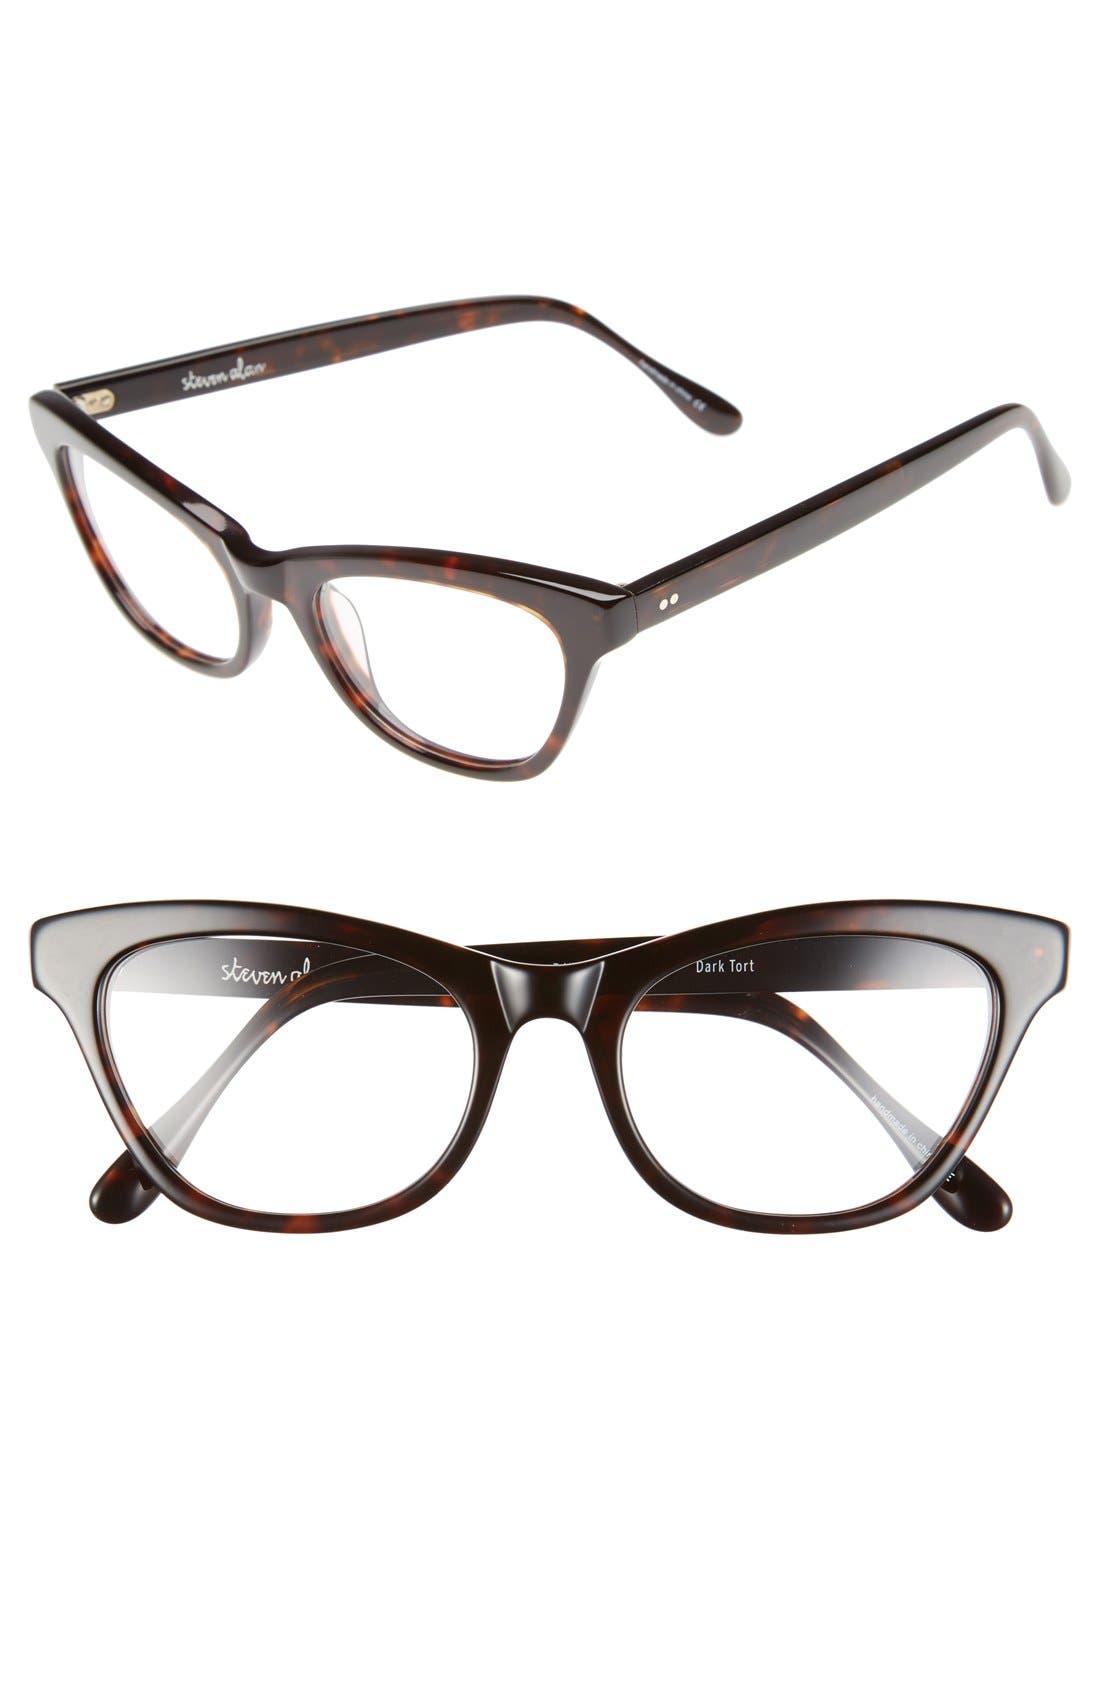 Main Image - Steven Alan 'Bayview' 51mm Cat Eye Optical Glasses